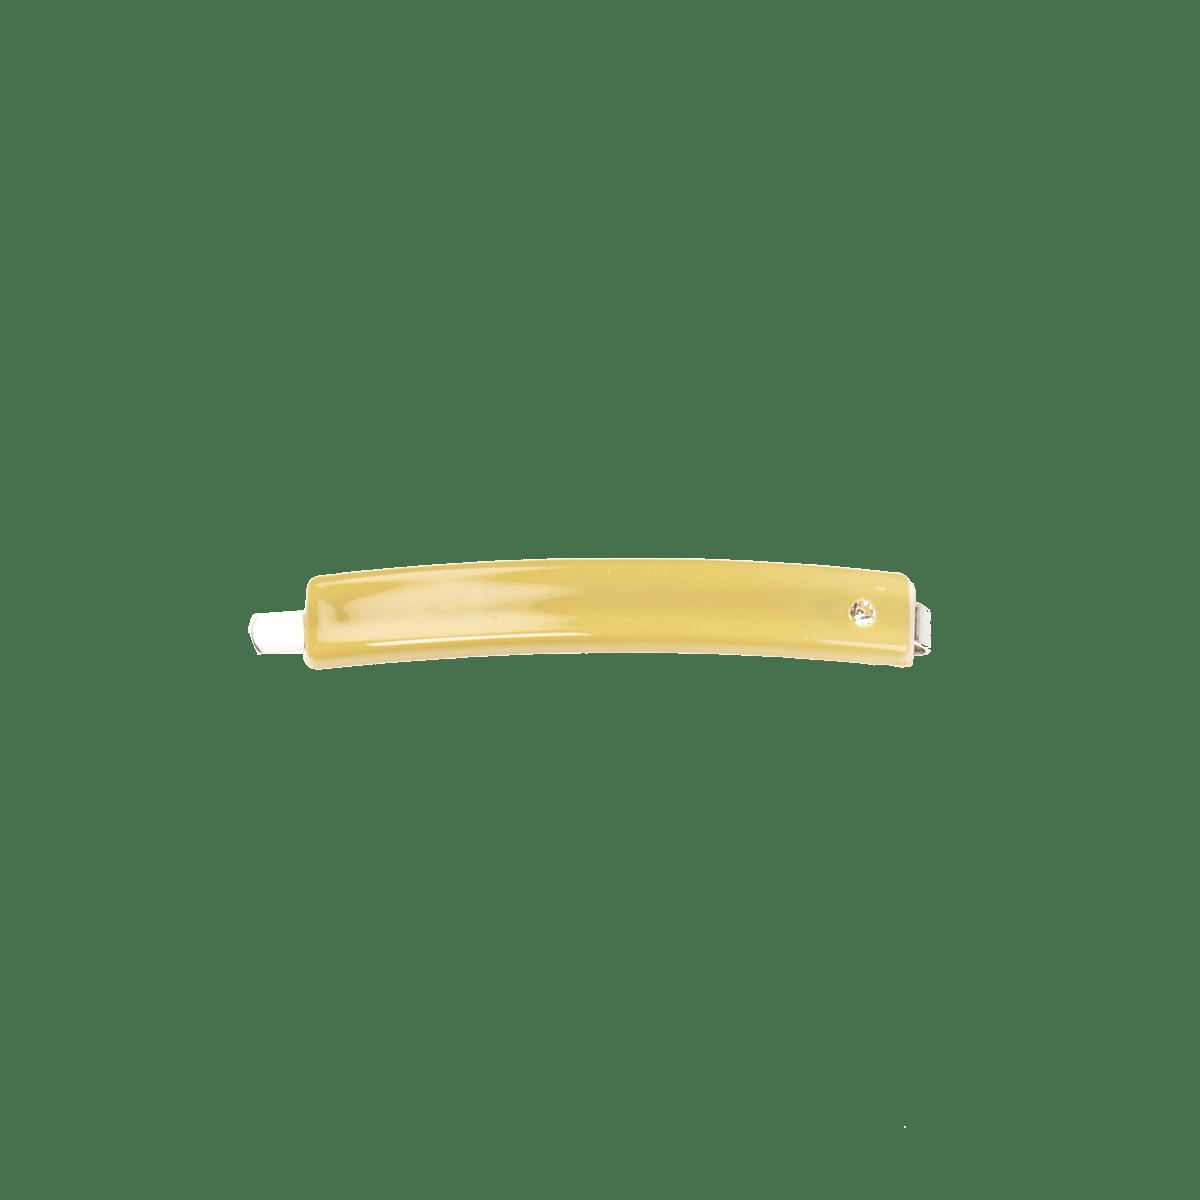 BON DEP - Pin clip, light yellow